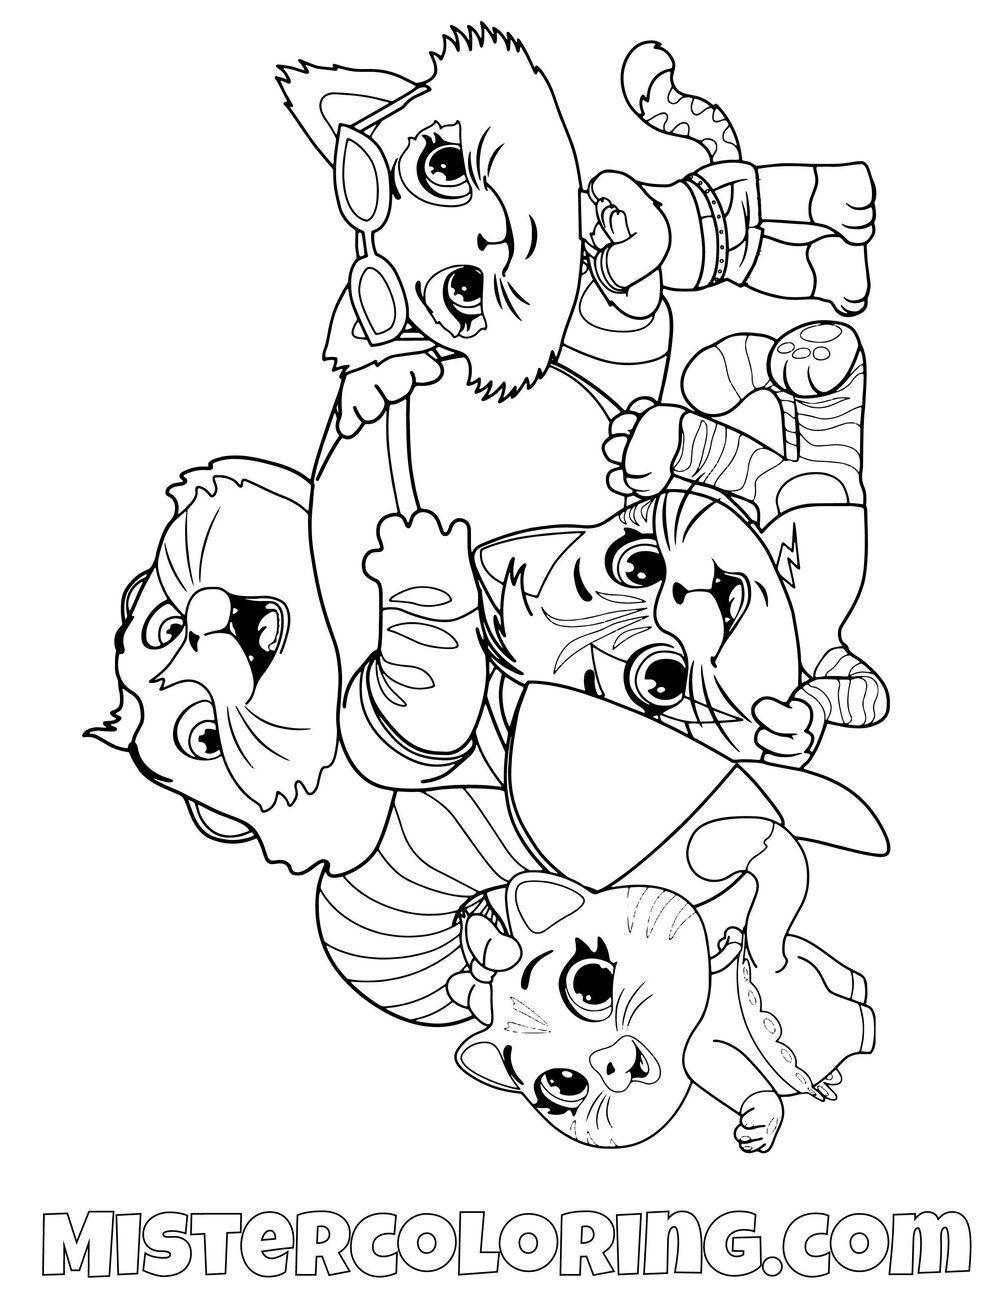 44 Cats Posing Milady Pilou Meatball Lampo 44 Cats Coloring Pages For Kids Cat Coloring Page Coloring Pages Coloring Pages For Kids